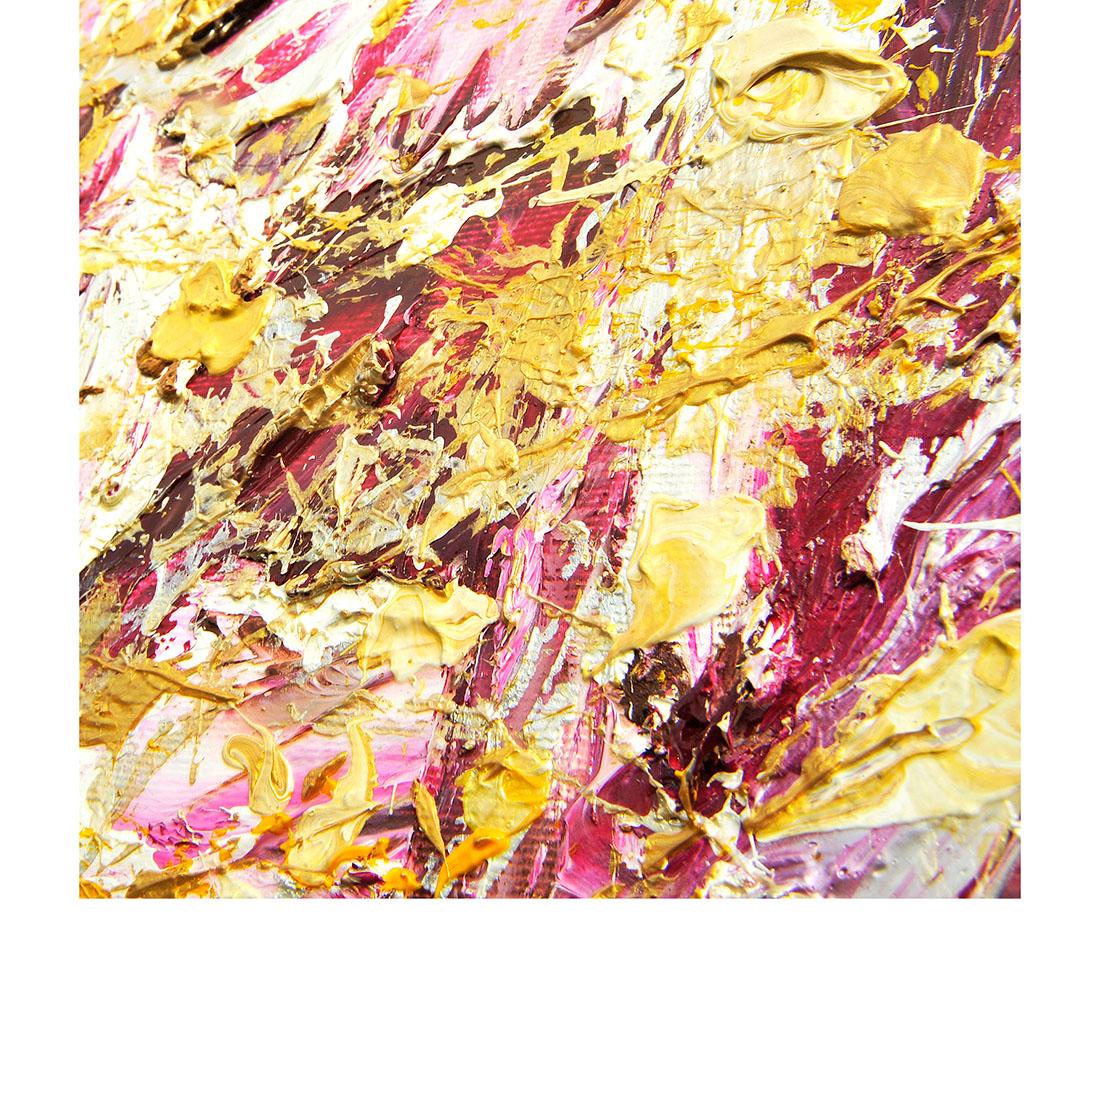 Soffio-100x70---Acrilico-su-tela---2014-B